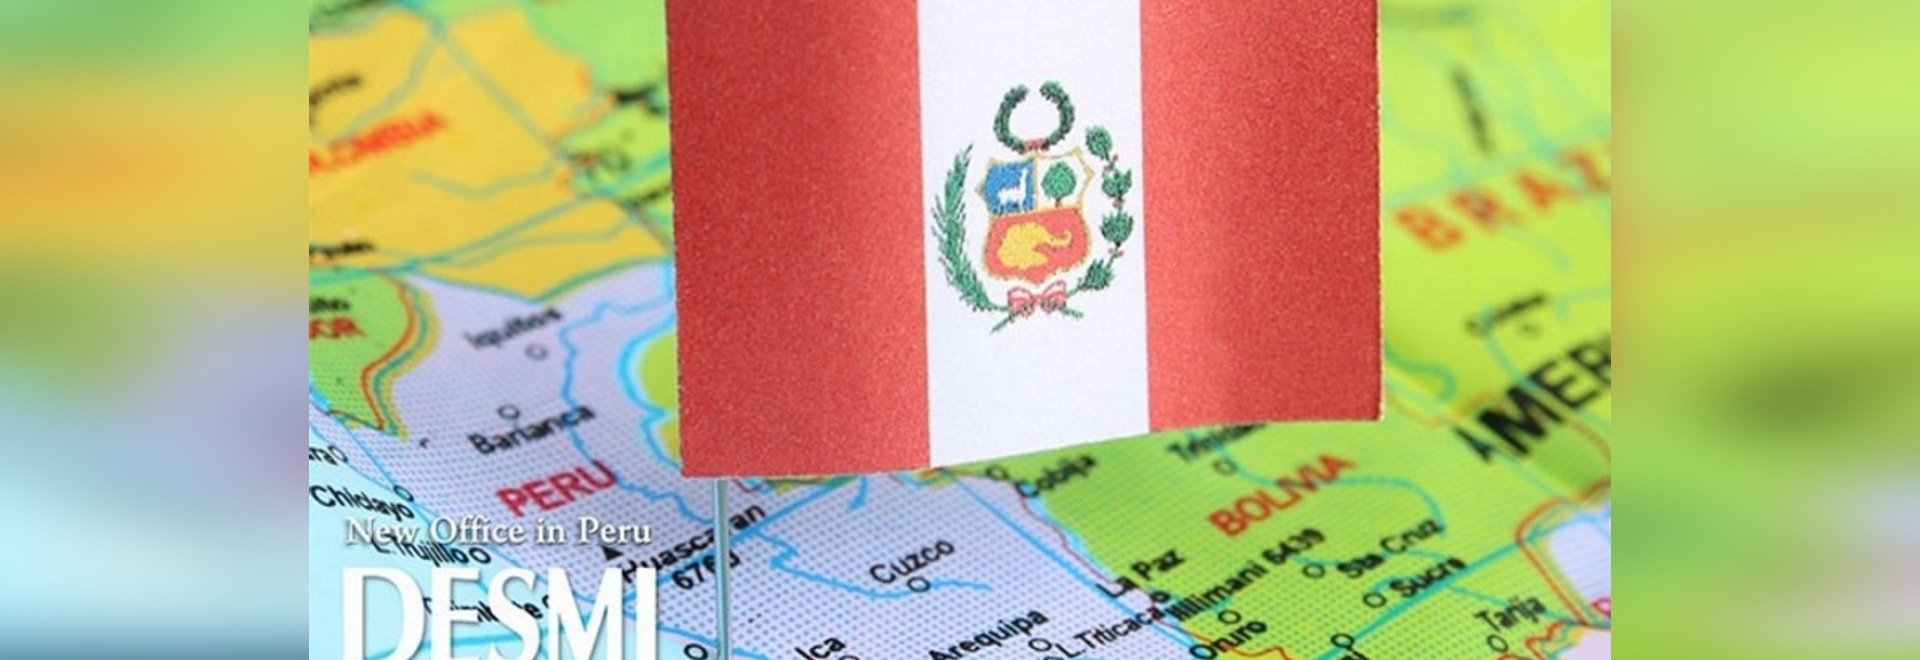 New Office in Growing Market Peru